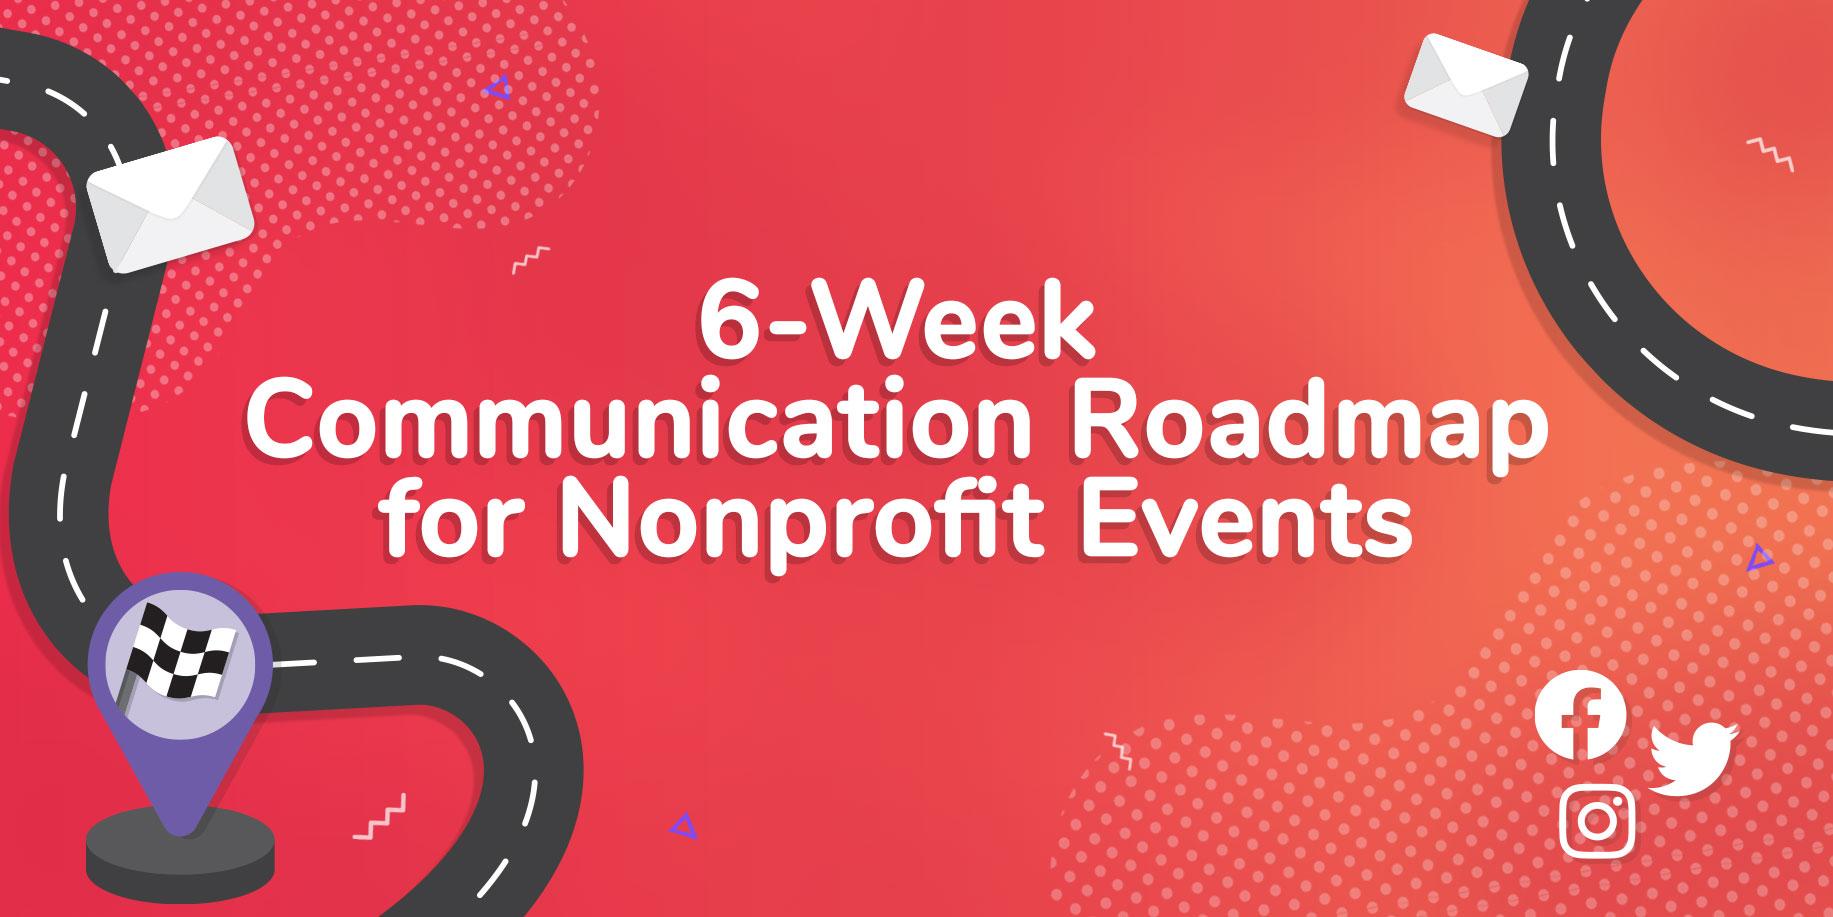 6 Week Communication Roadmap for Nonprofit Events